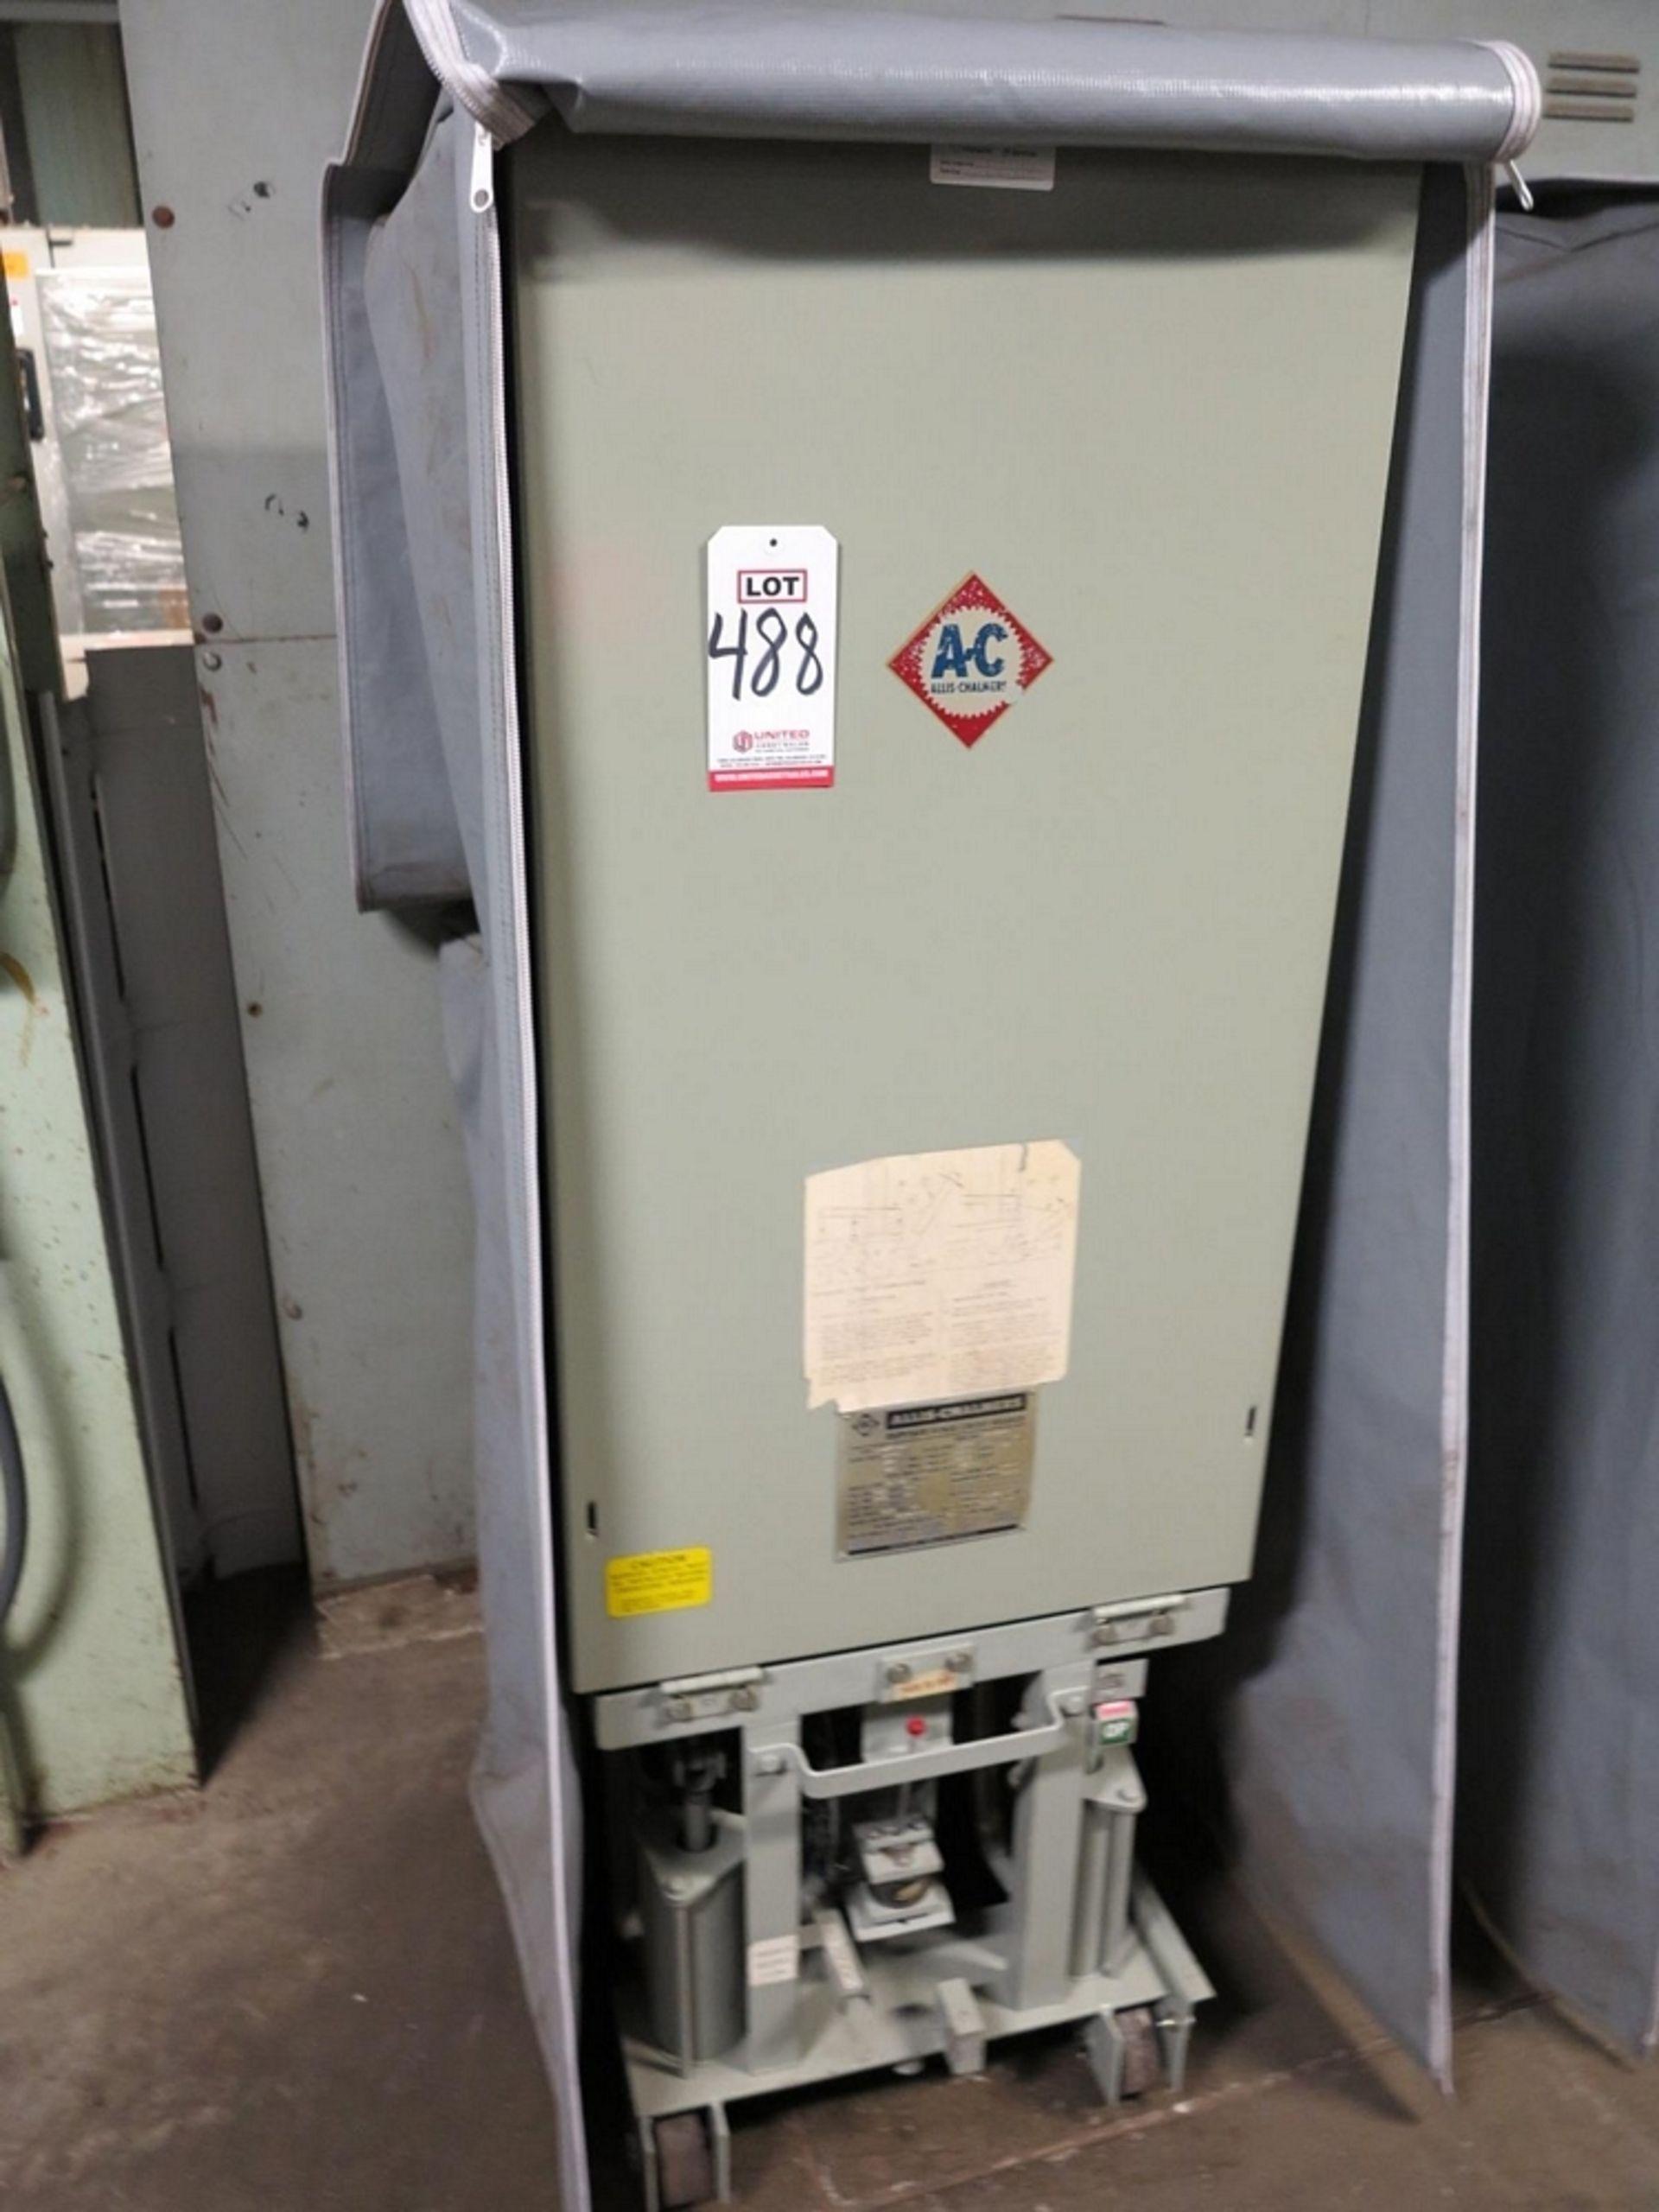 Lot 488 - ALLIS CHALMERS CIRCUIT BREAKER, TYPE MA-250A-1, 4160 V, 1200 A